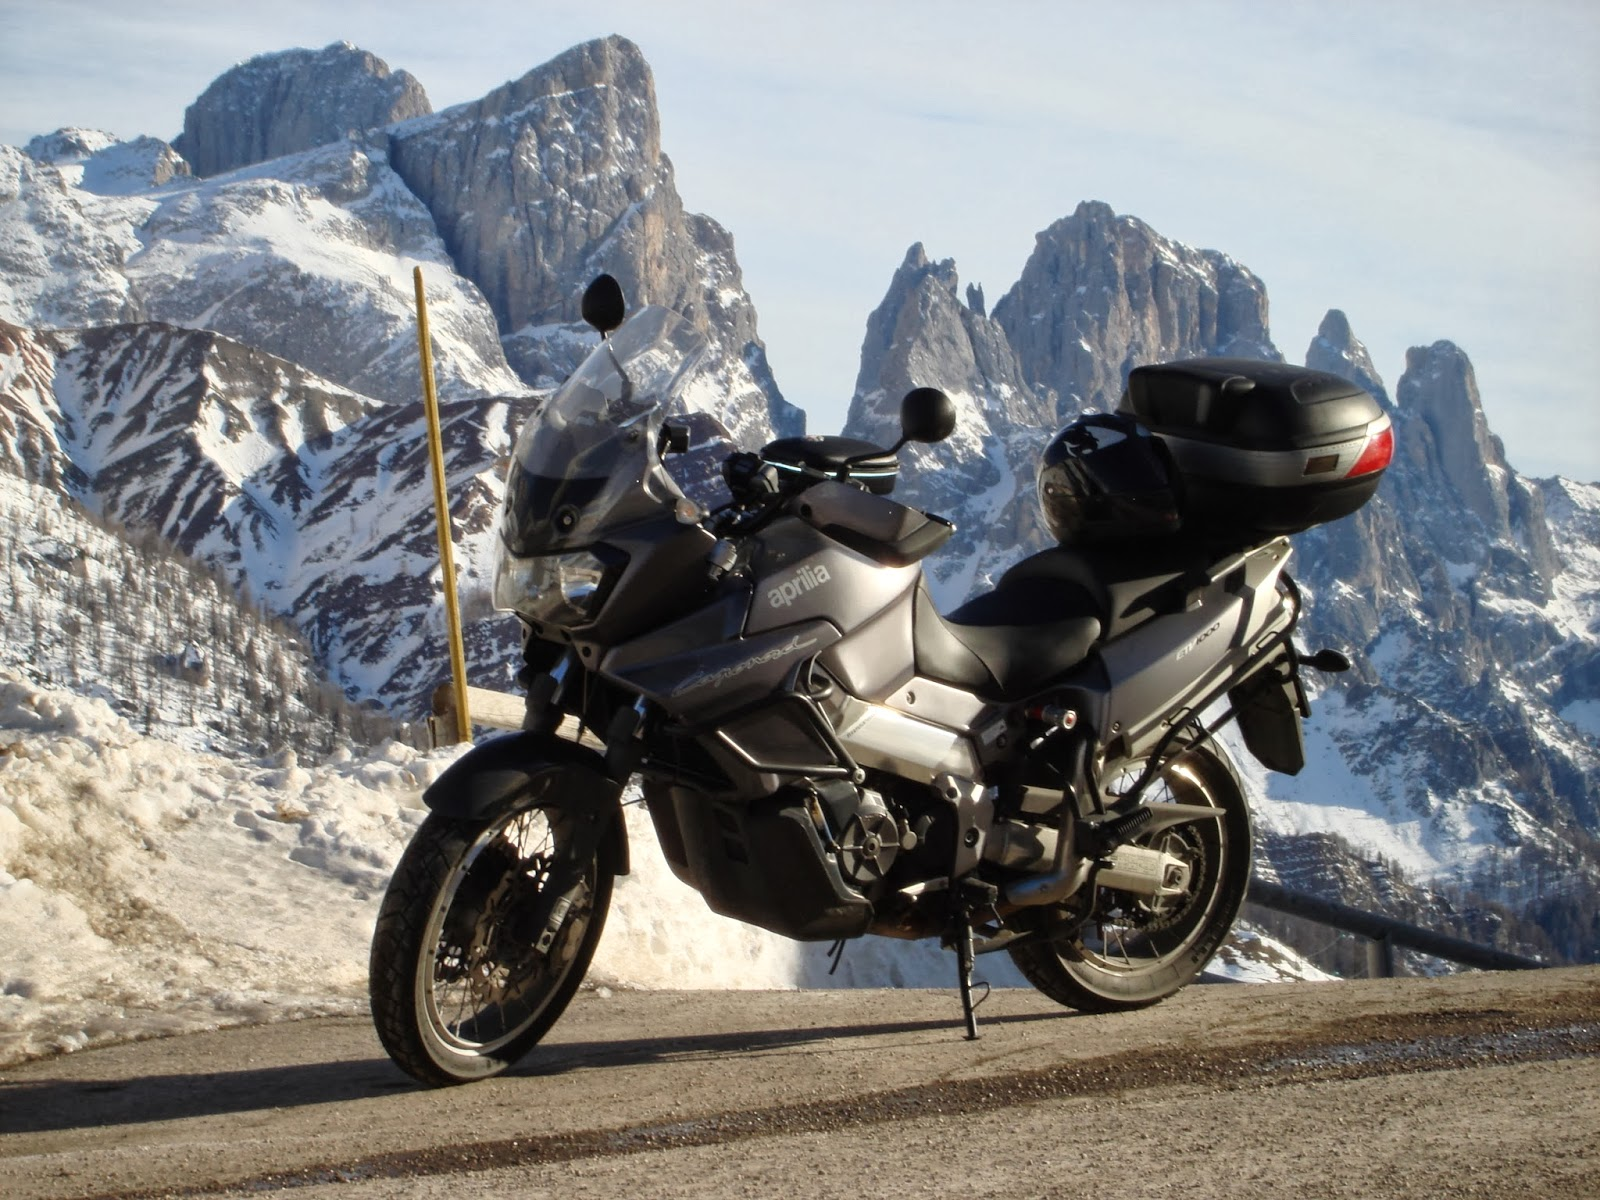 Aprilia ETV 1000cc Caponord New Motorcycles